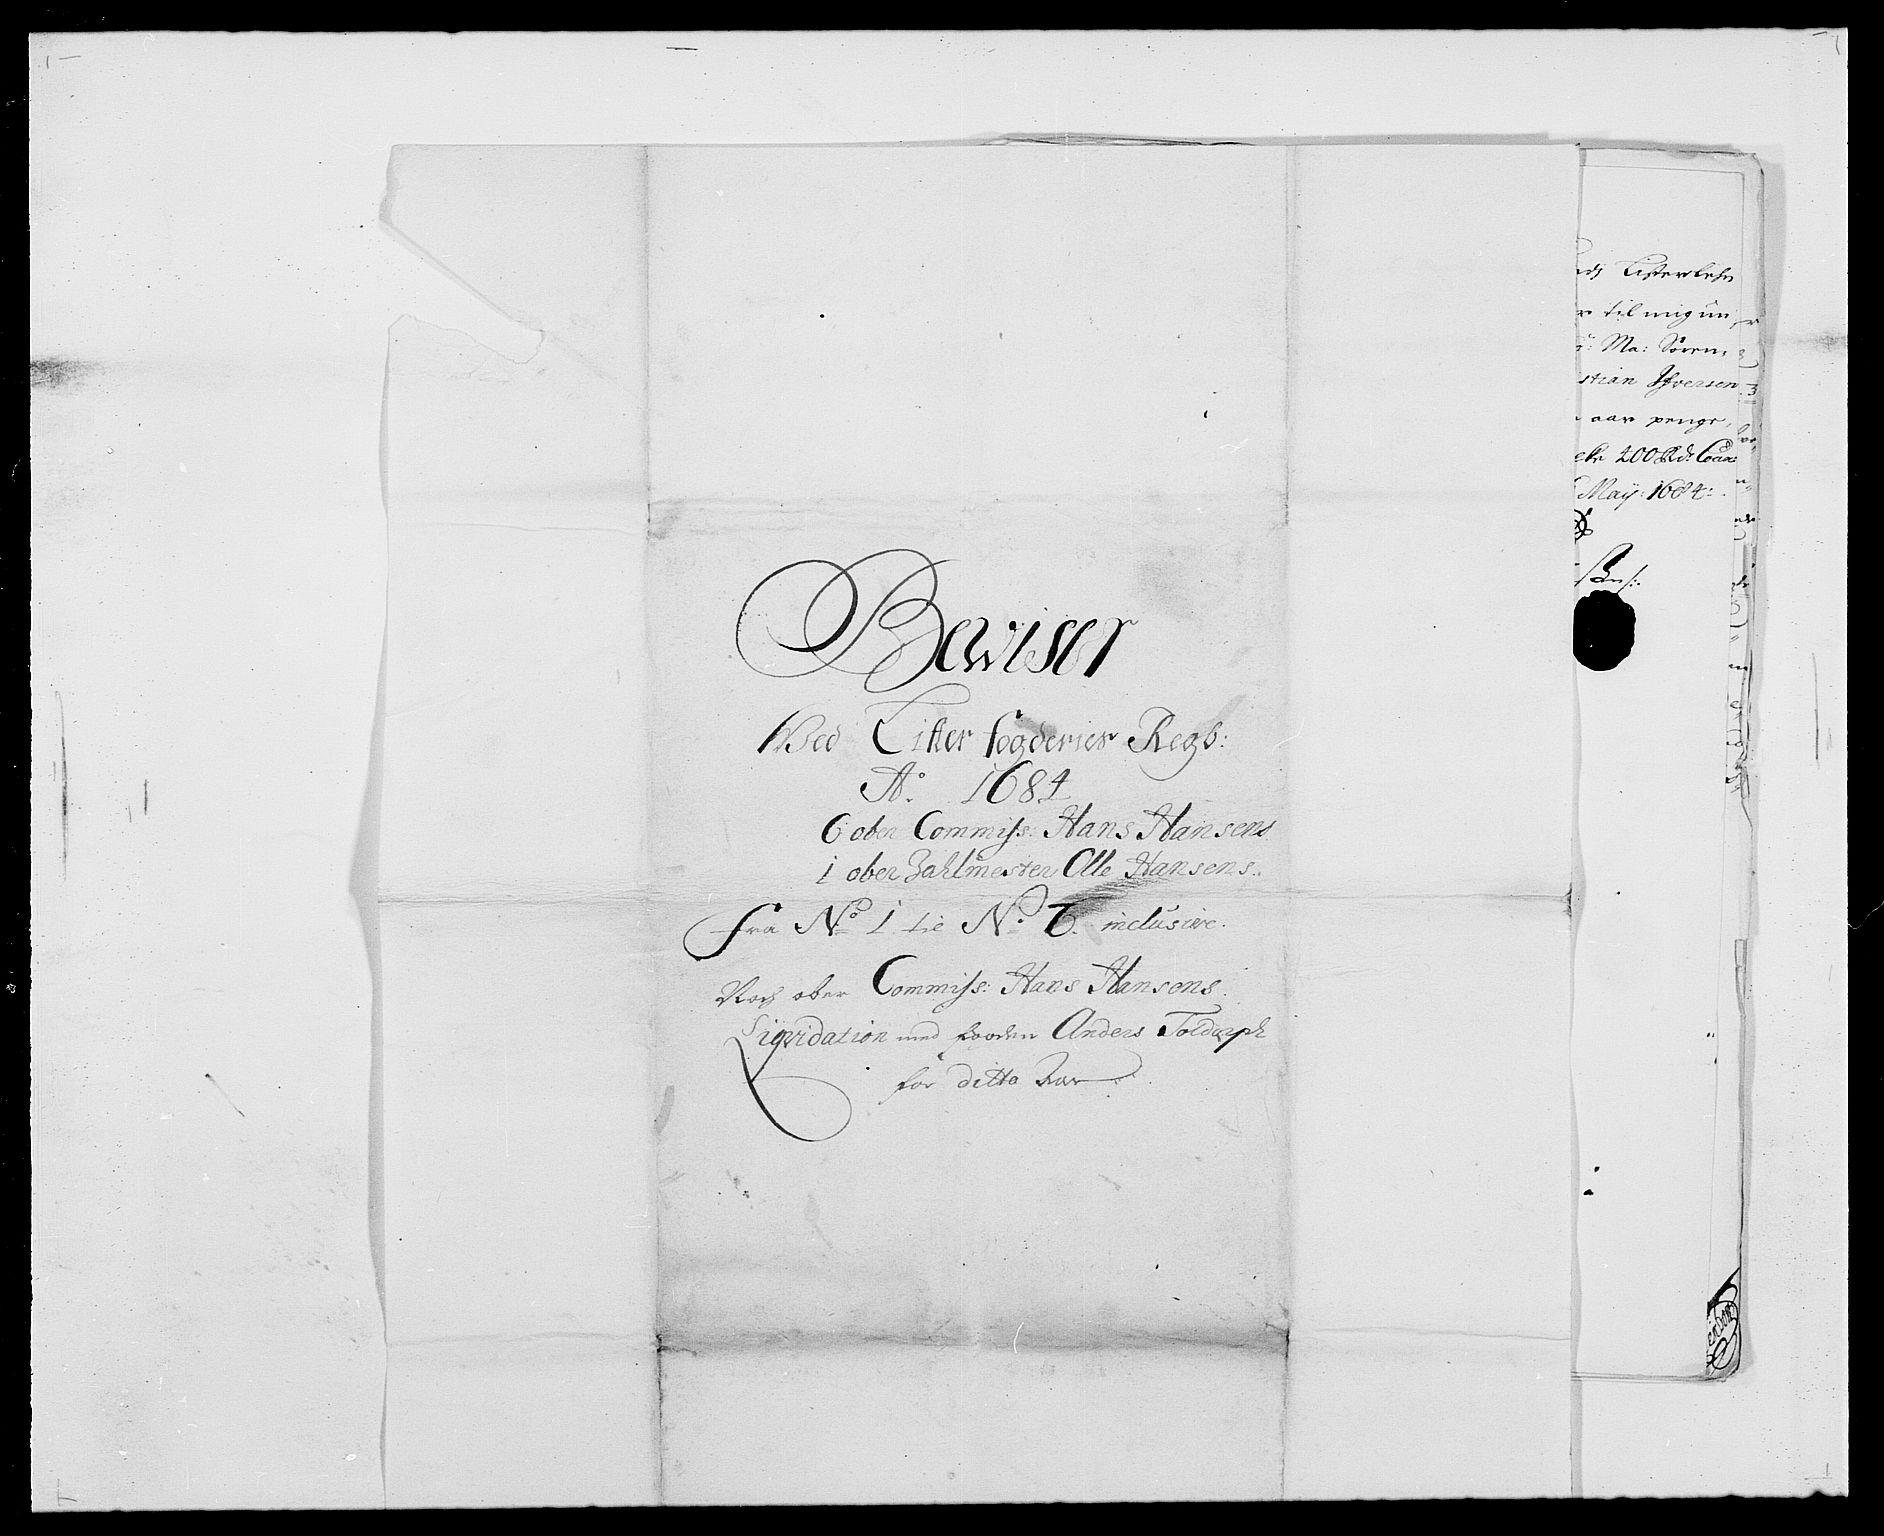 RA, Rentekammeret inntil 1814, Reviderte regnskaper, Fogderegnskap, R41/L2533: Fogderegnskap Lista, 1684-1685, s. 145